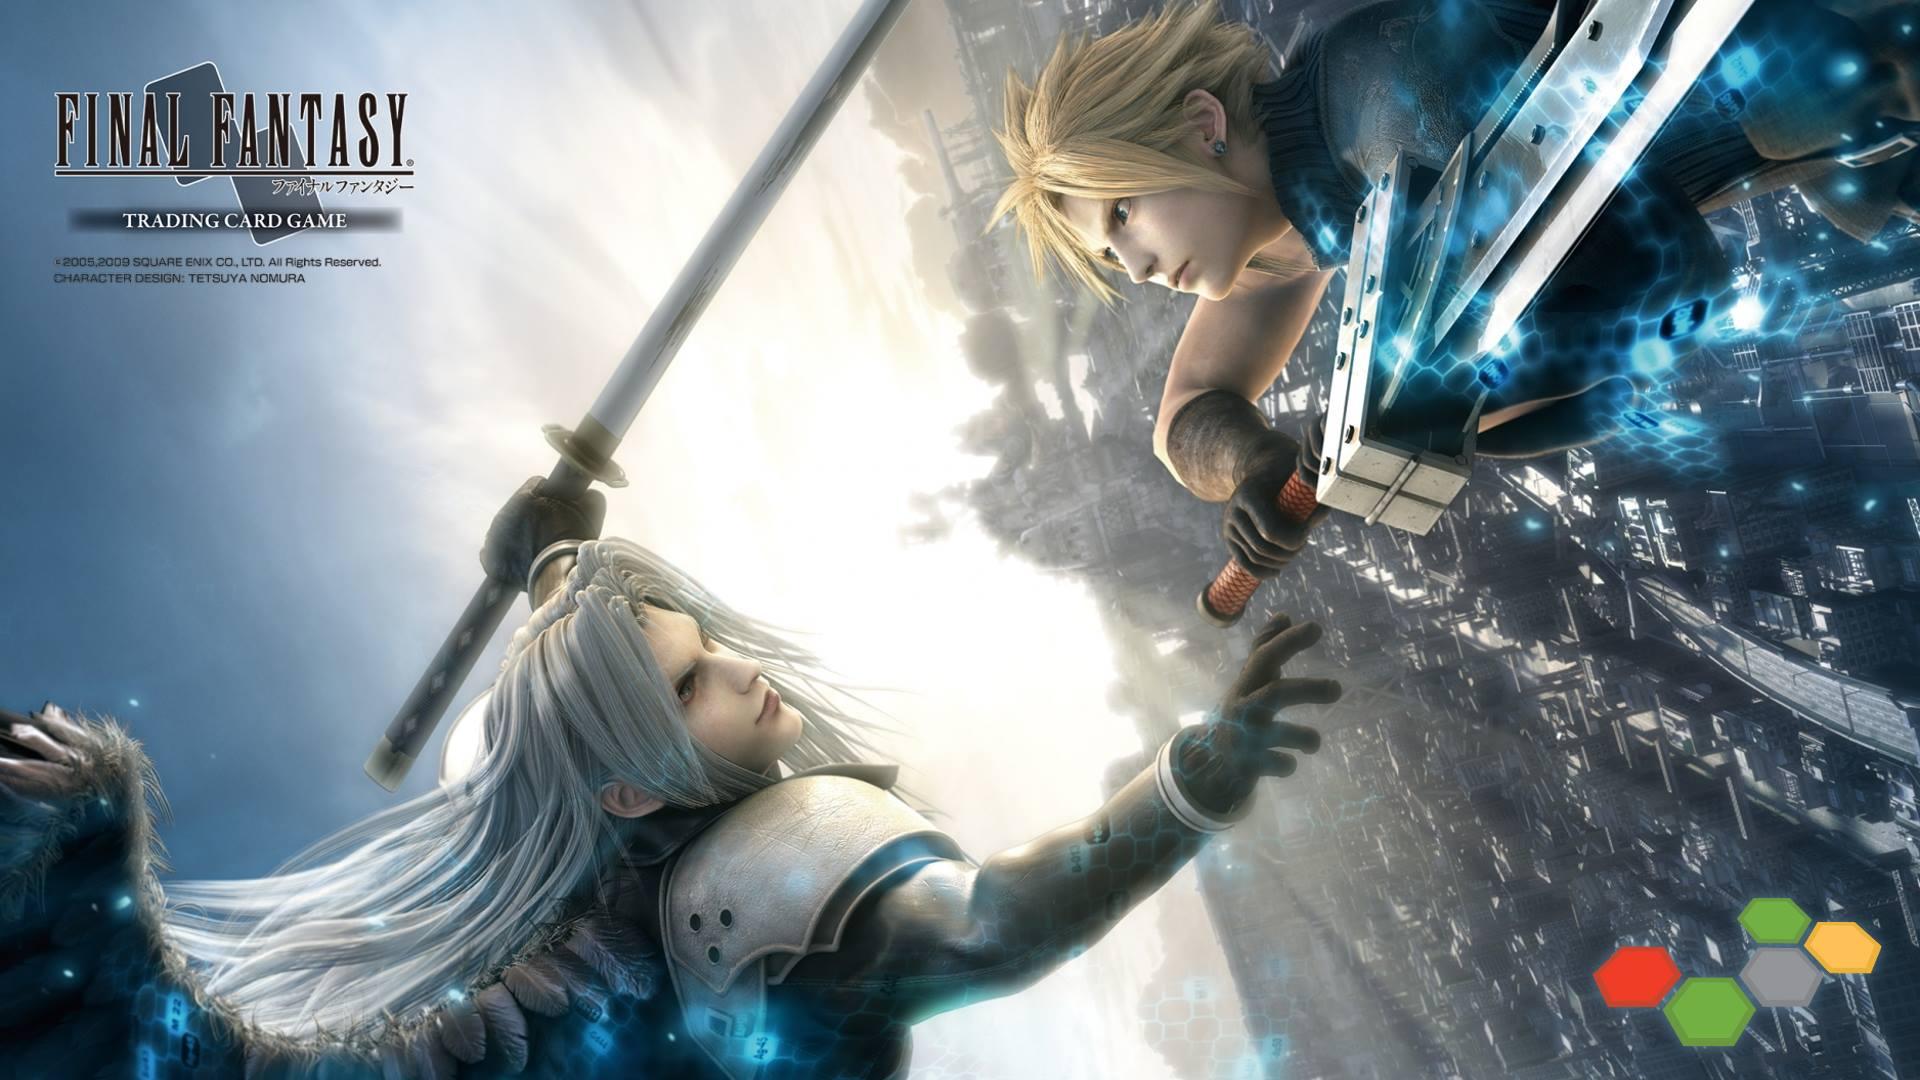 Final Fantasy TCG Event Image.jpg